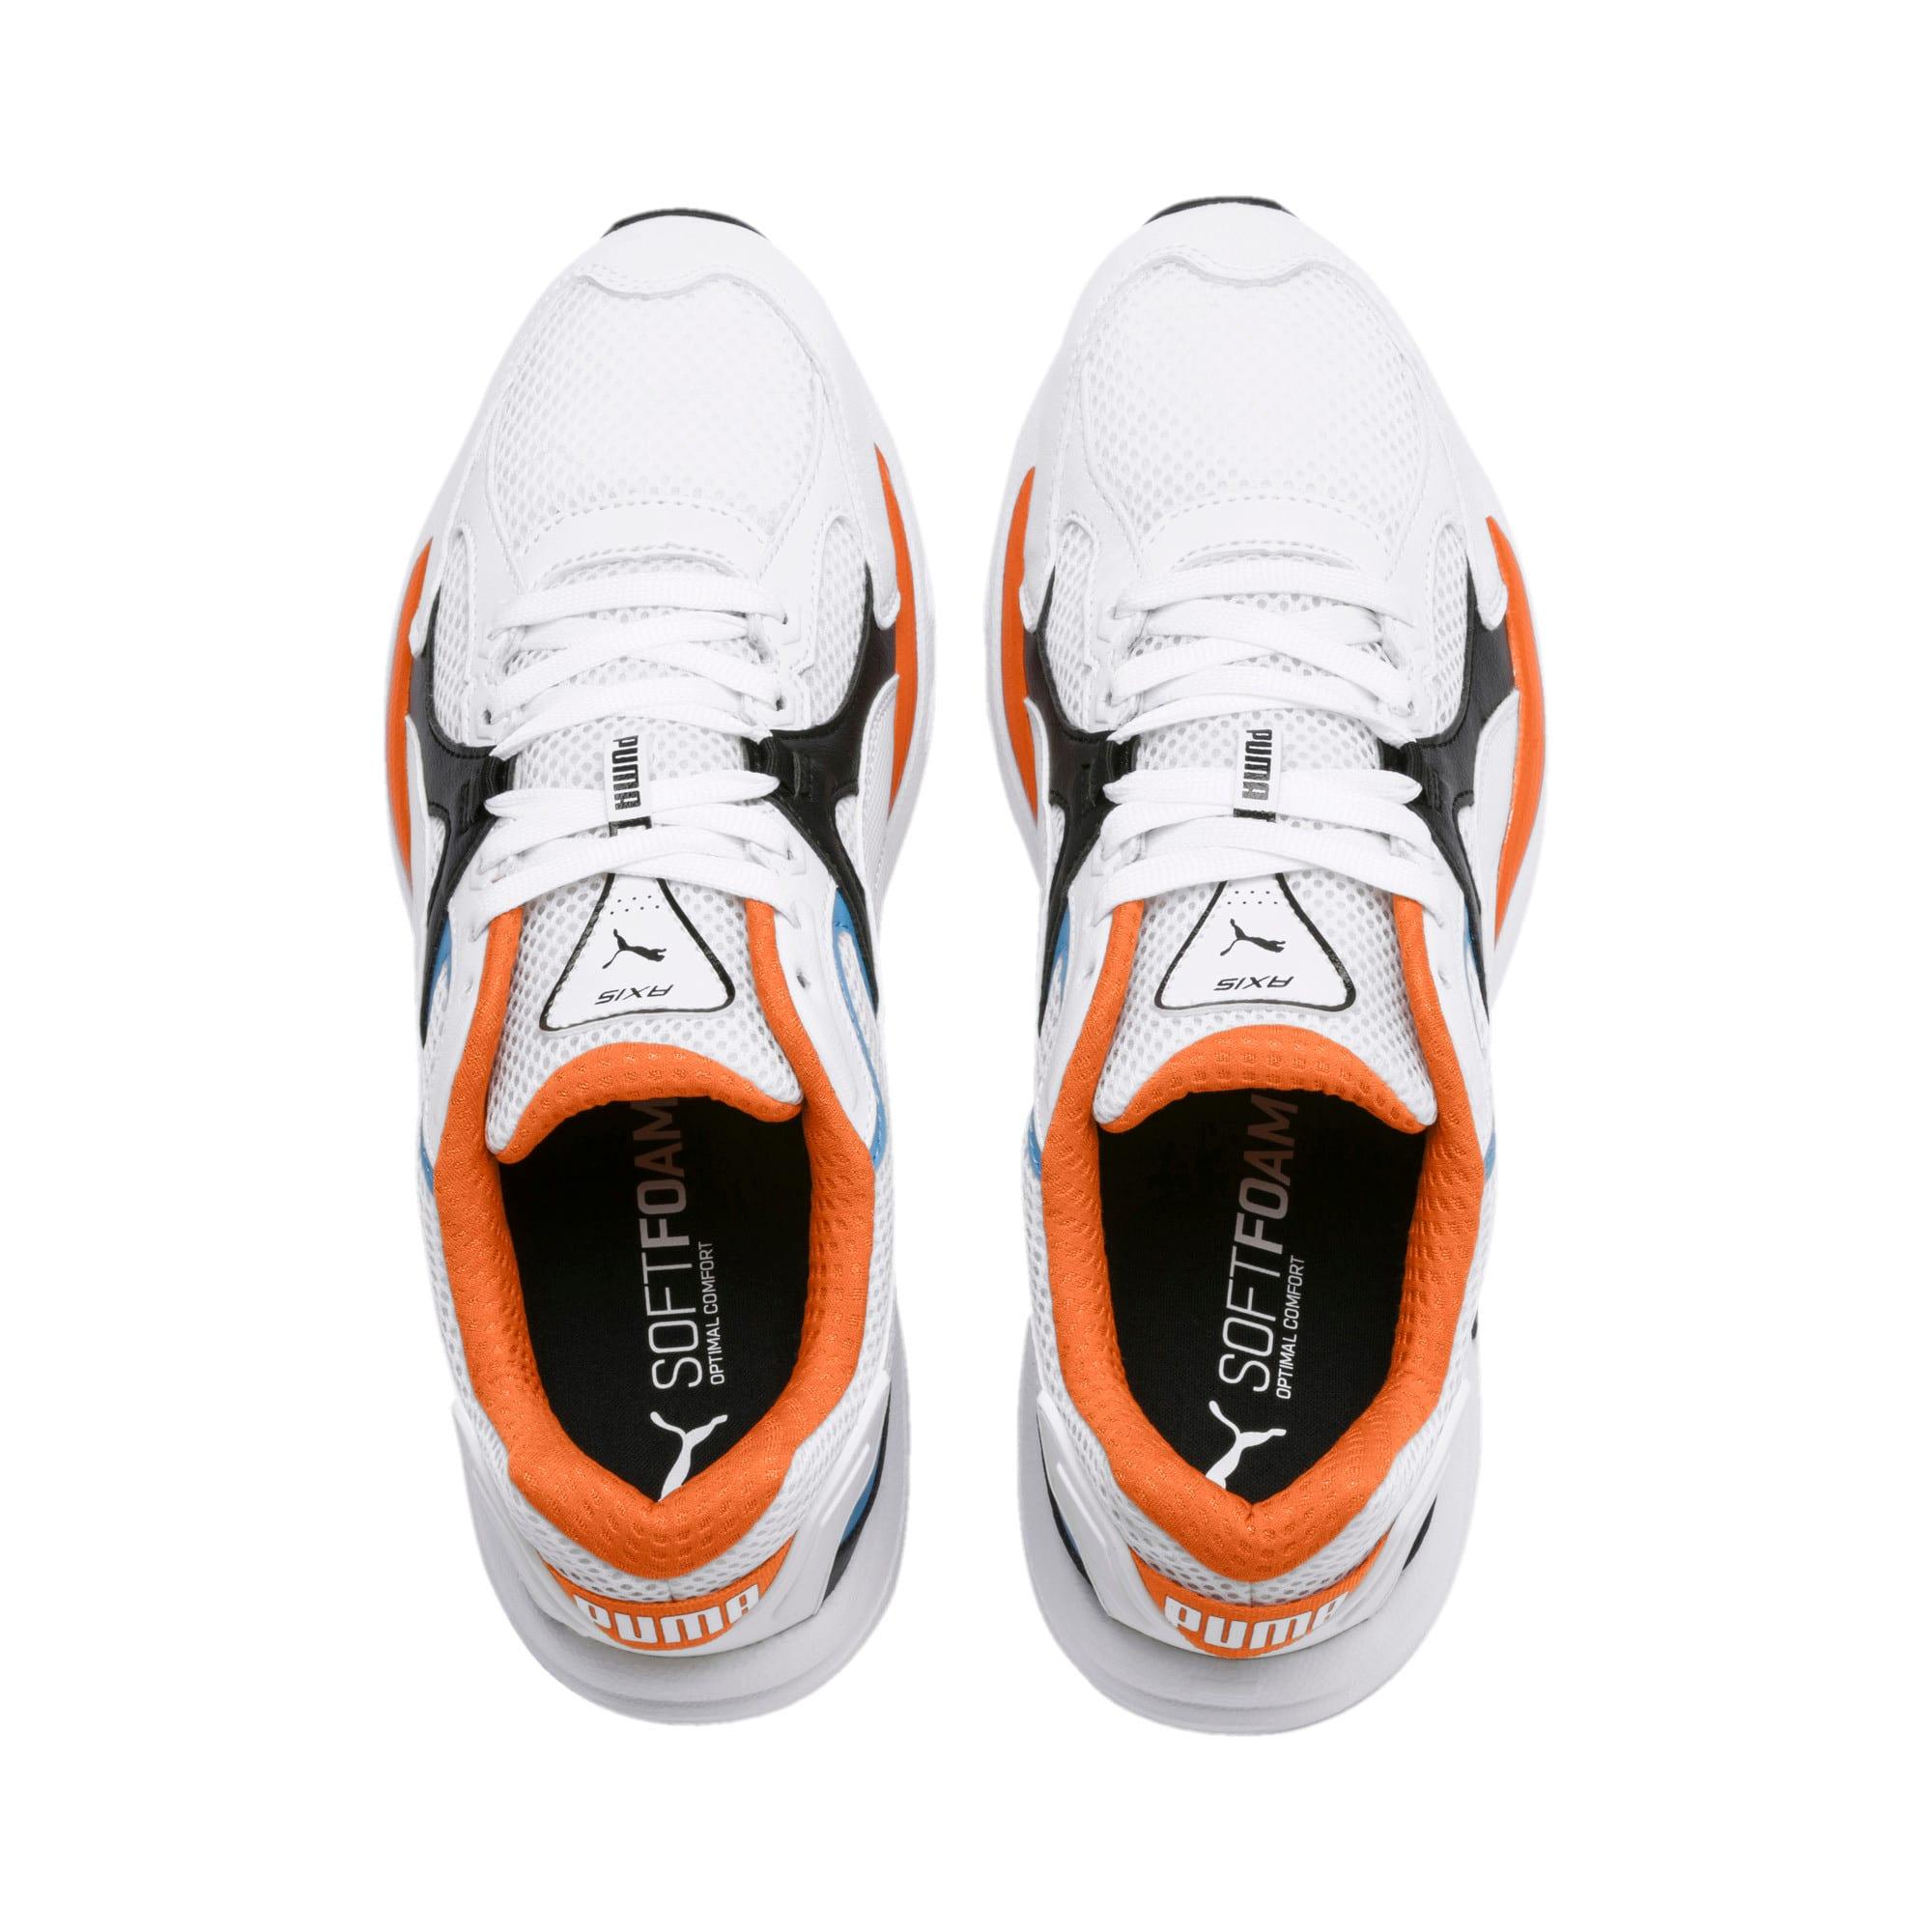 Thumbnail 7 of Axis Plus 90s Sneakers, White-Blk-T Lt Blue-J Orange, medium